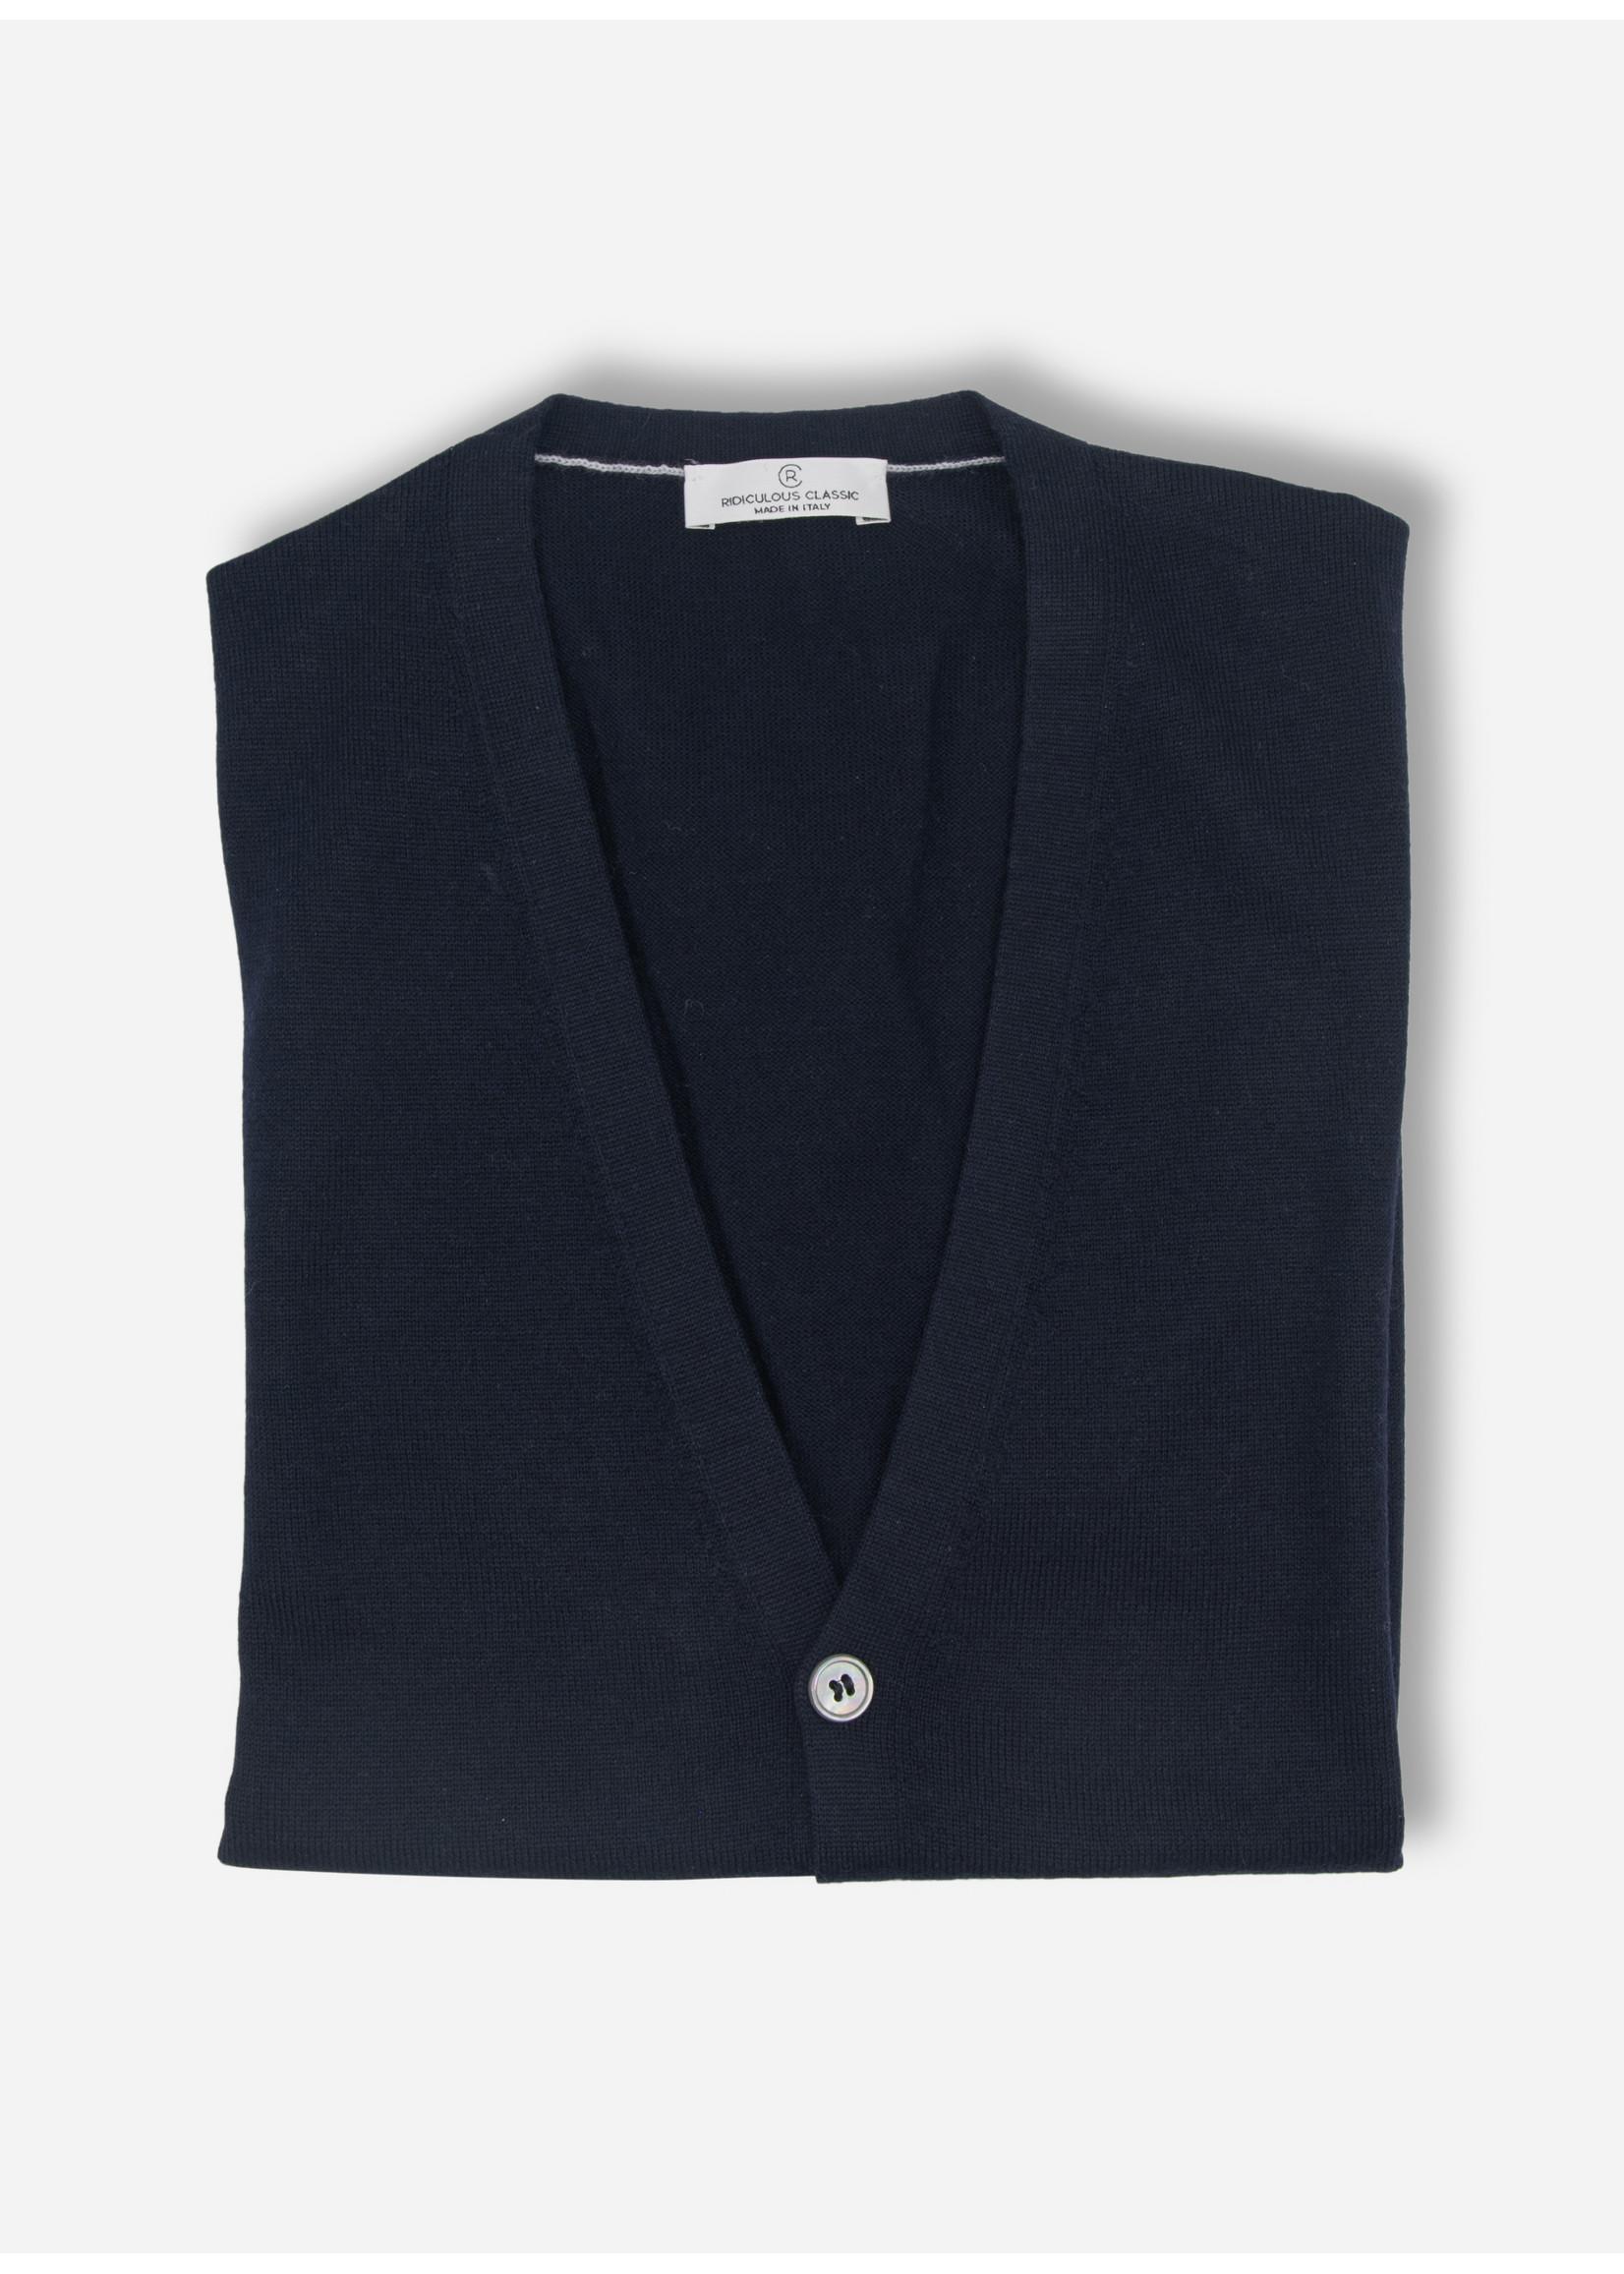 Ridiculous Classic Cardigan sleeveless merino navy